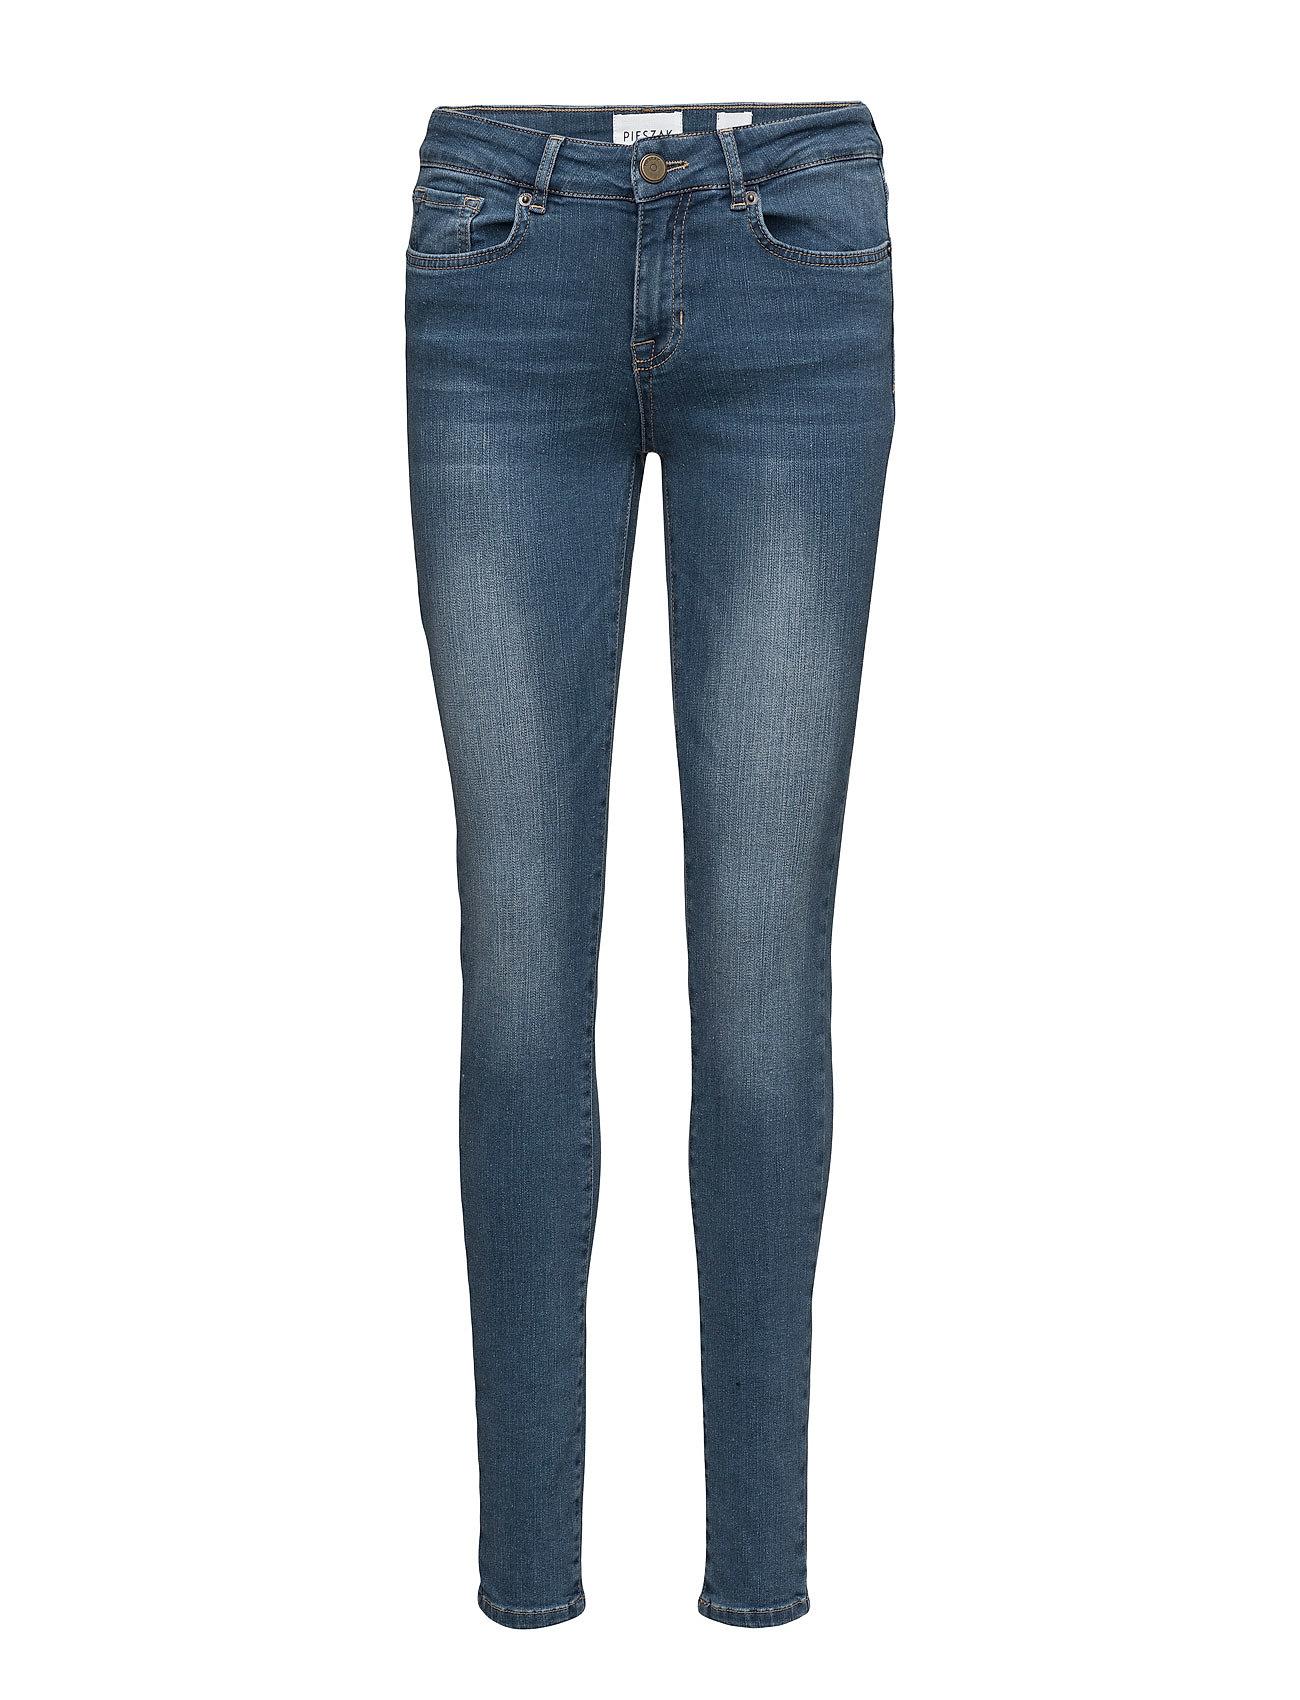 Pieszak Diva skinny wash Amalfi Jeans